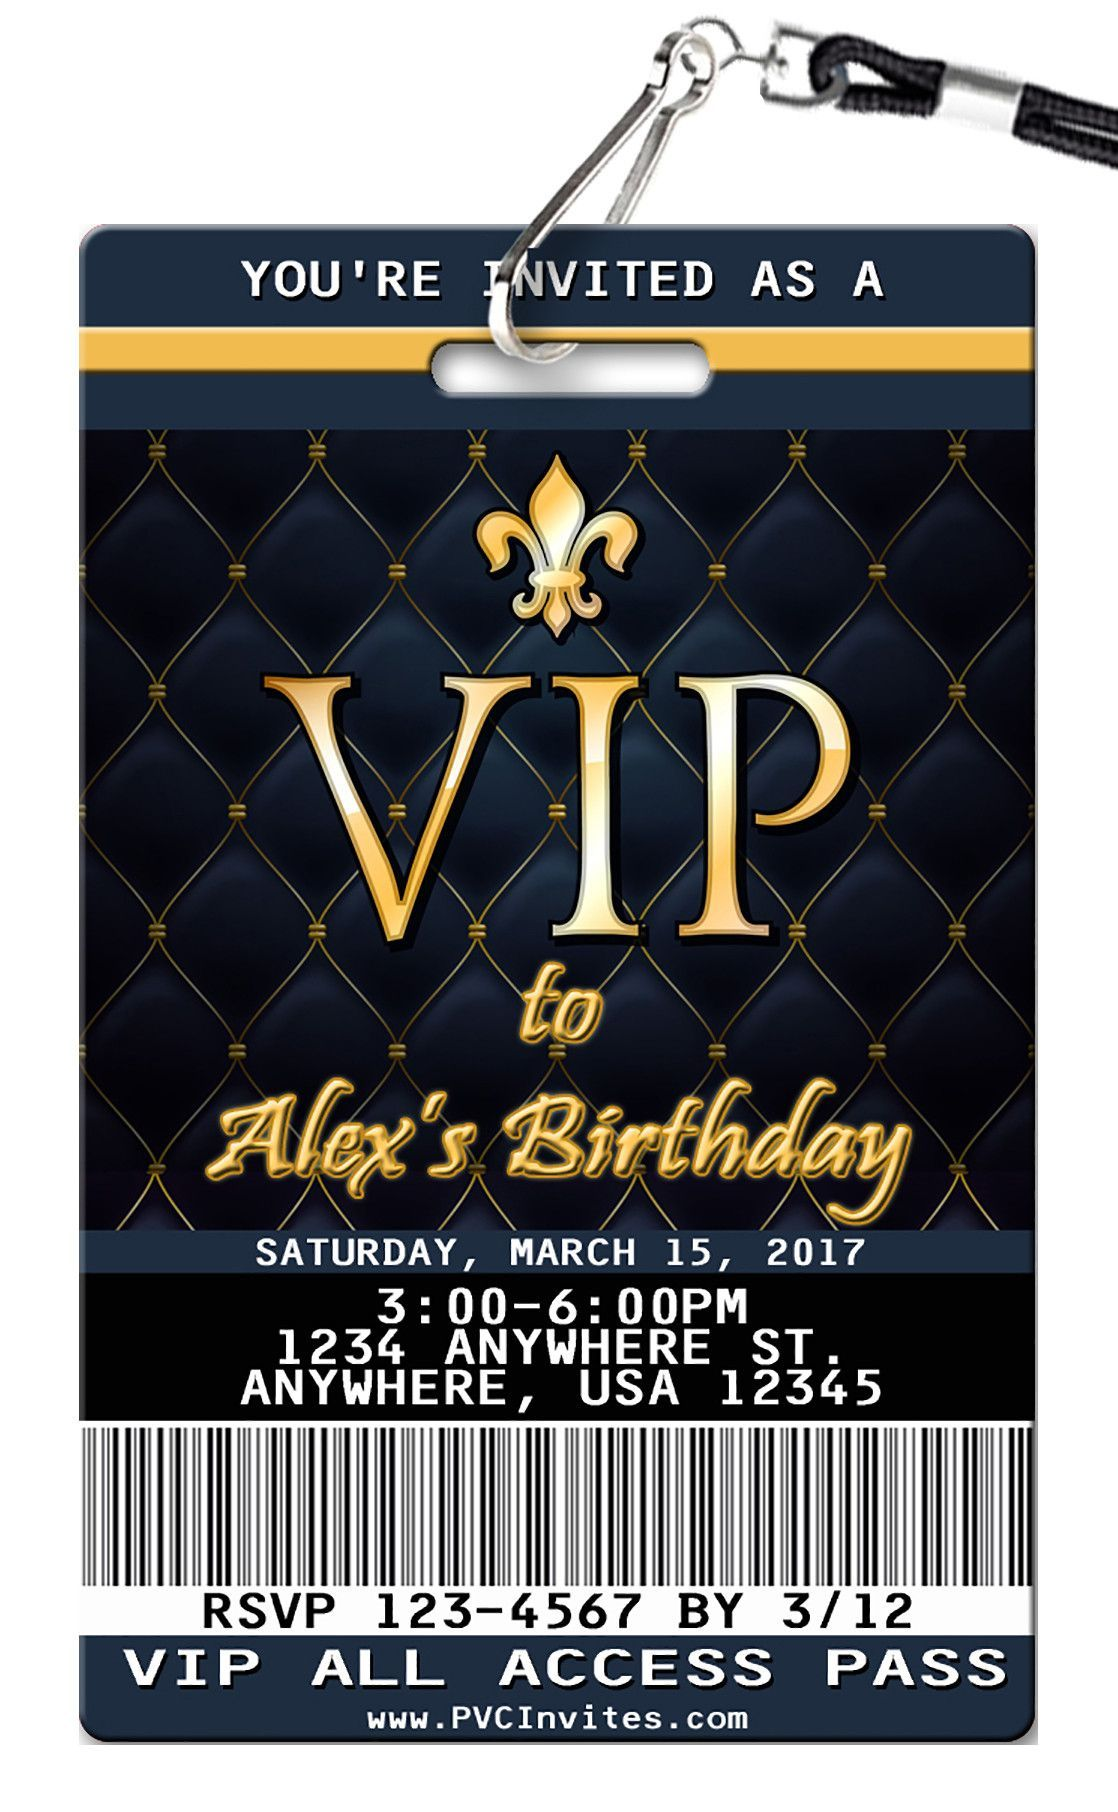 Vip vip birthdays and 30th birthday party themes birthday party ideas vip stopboris Choice Image